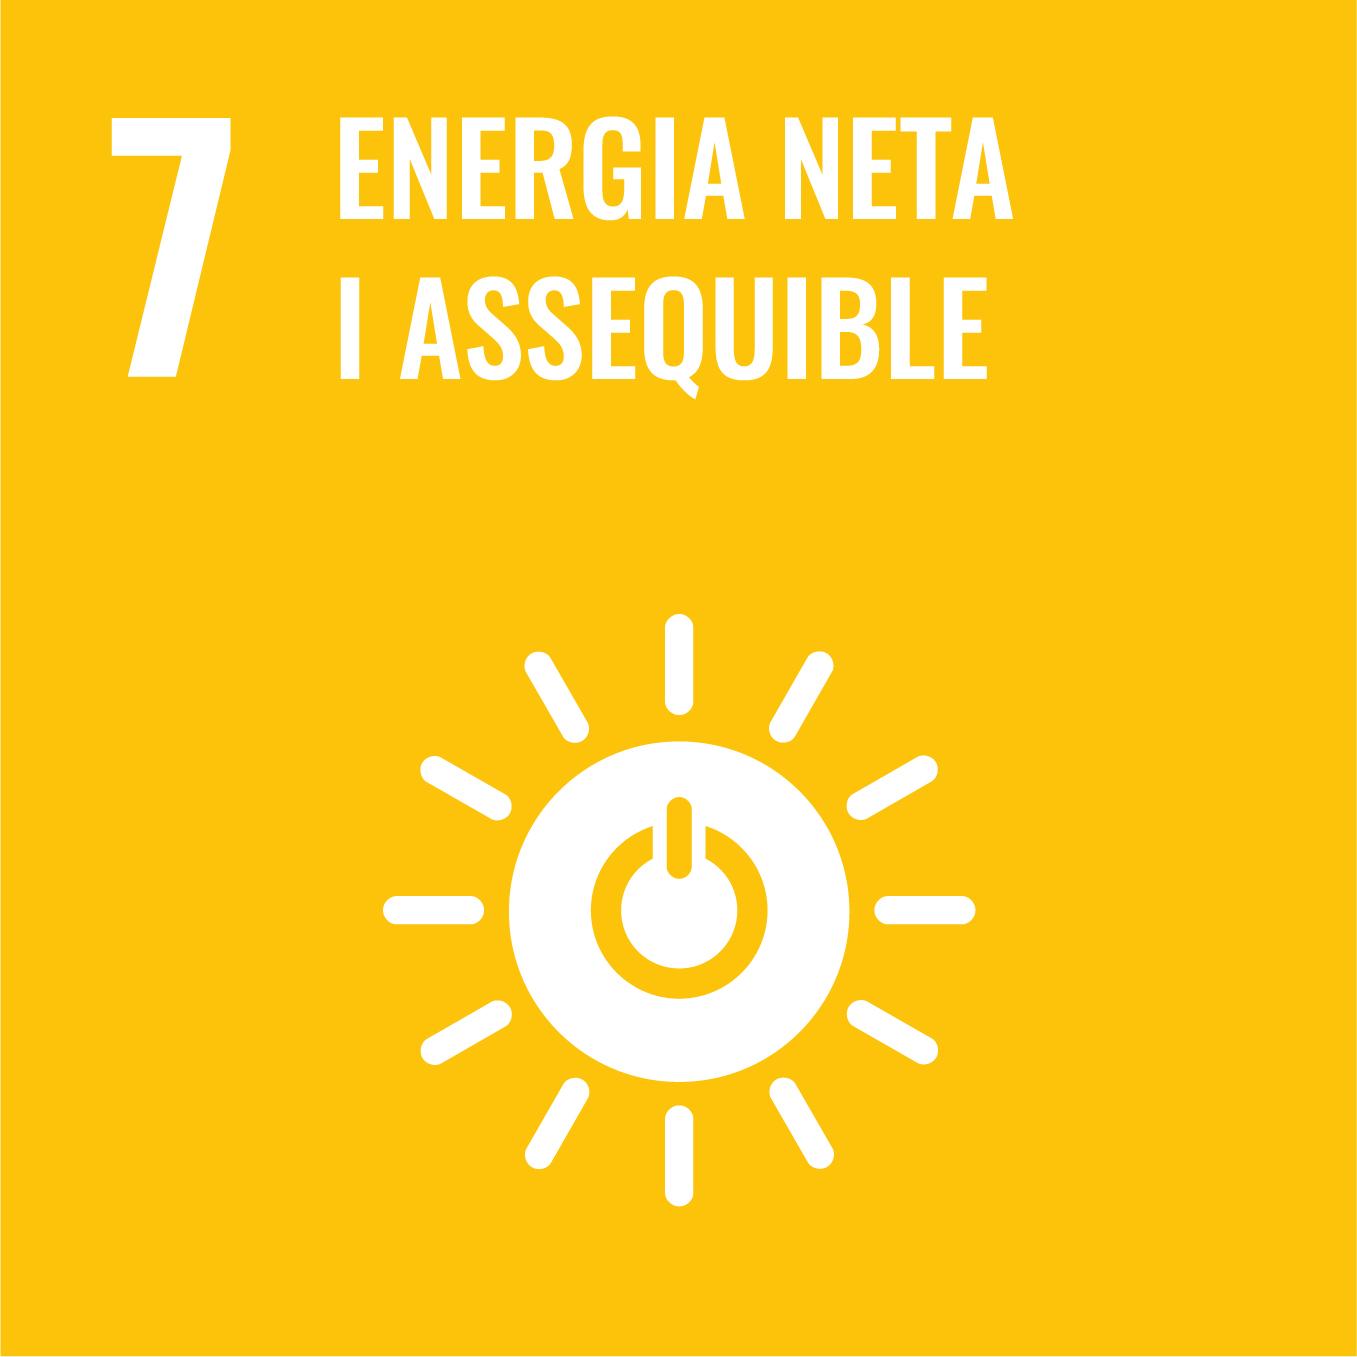 Energia neta i assequible - Objectiu 7